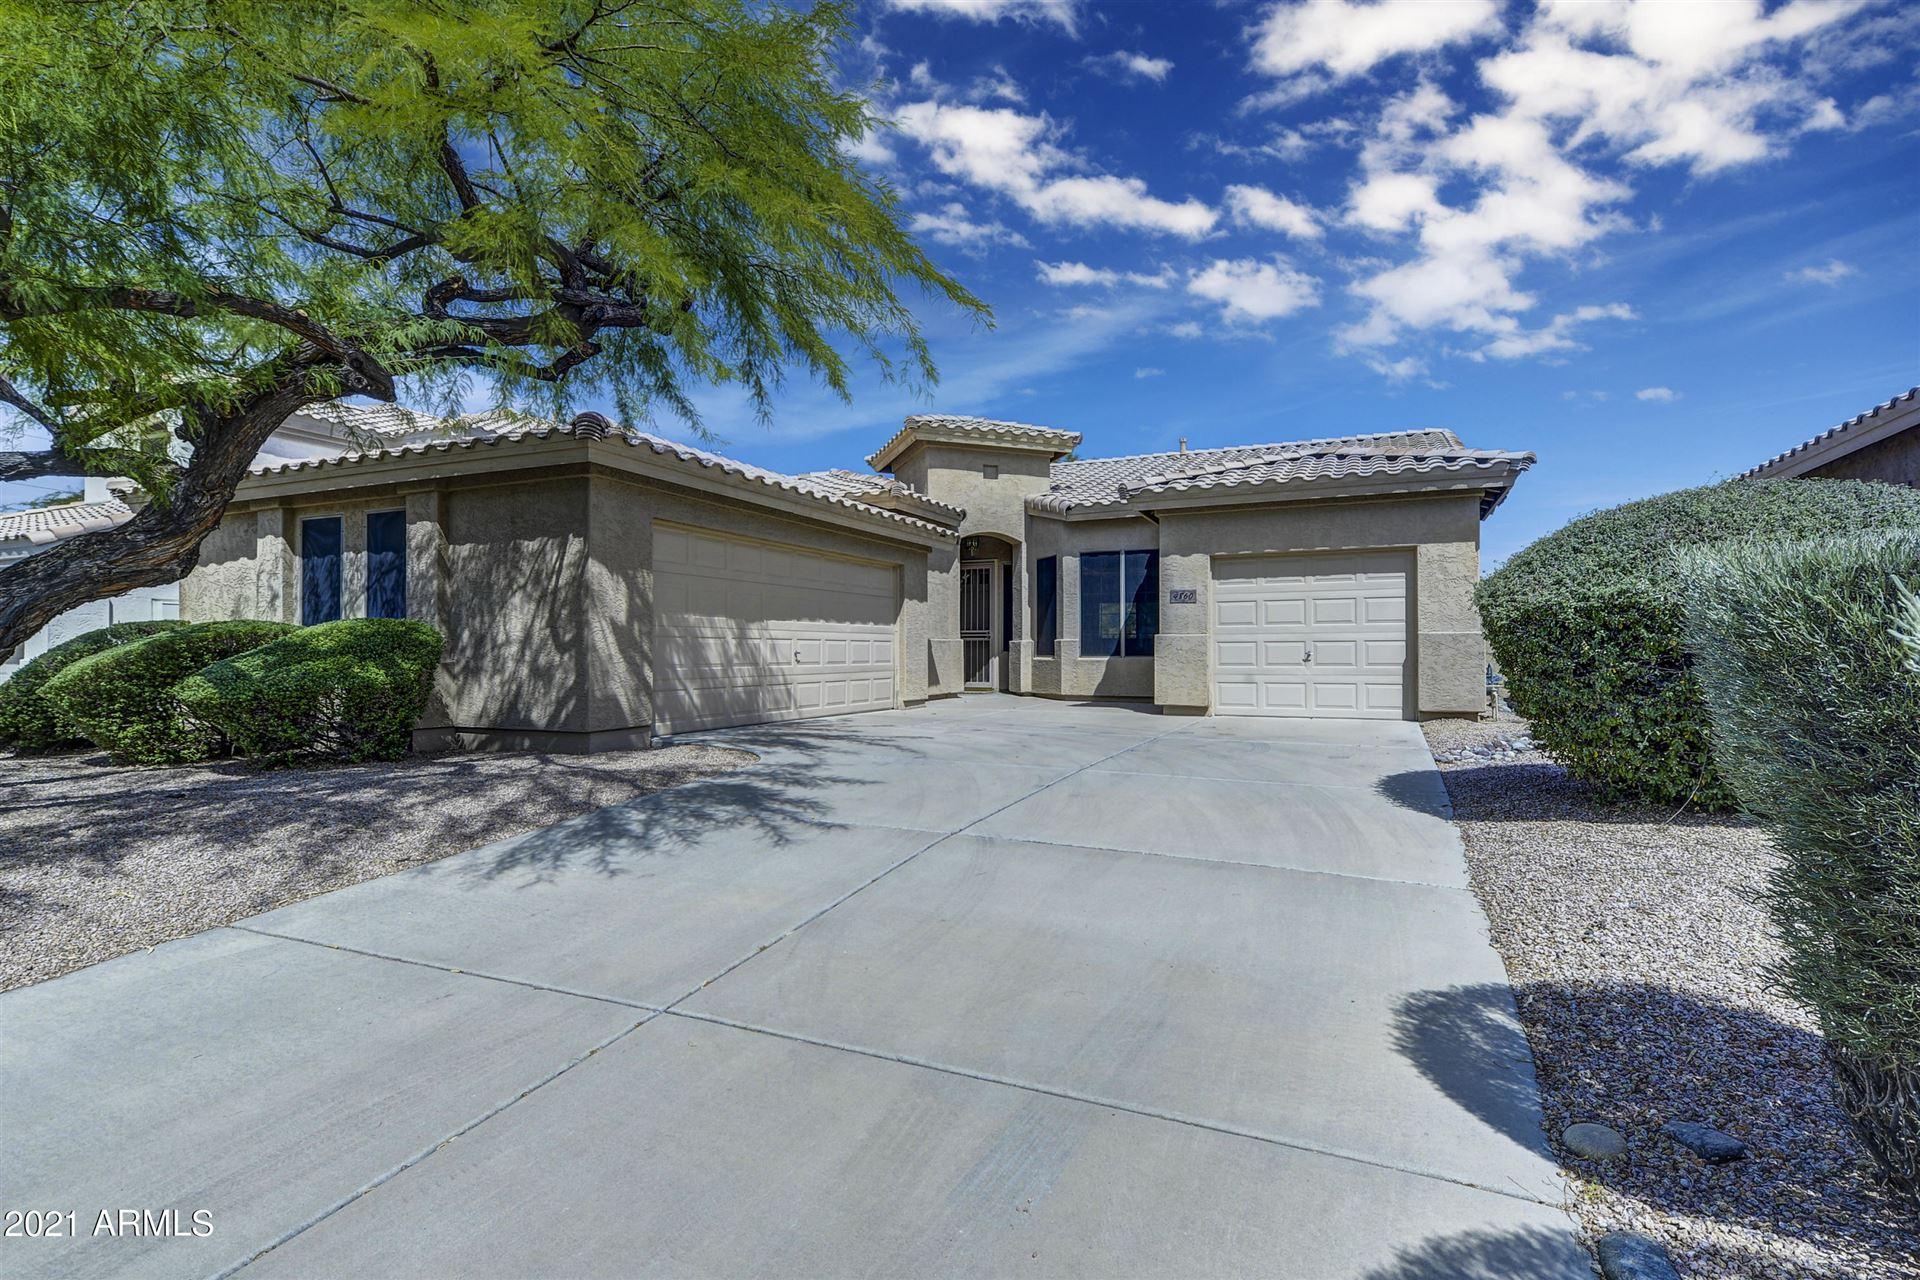 Photo of 4860 E BARWICK Drive, Cave Creek, AZ 85331 (MLS # 6263621)